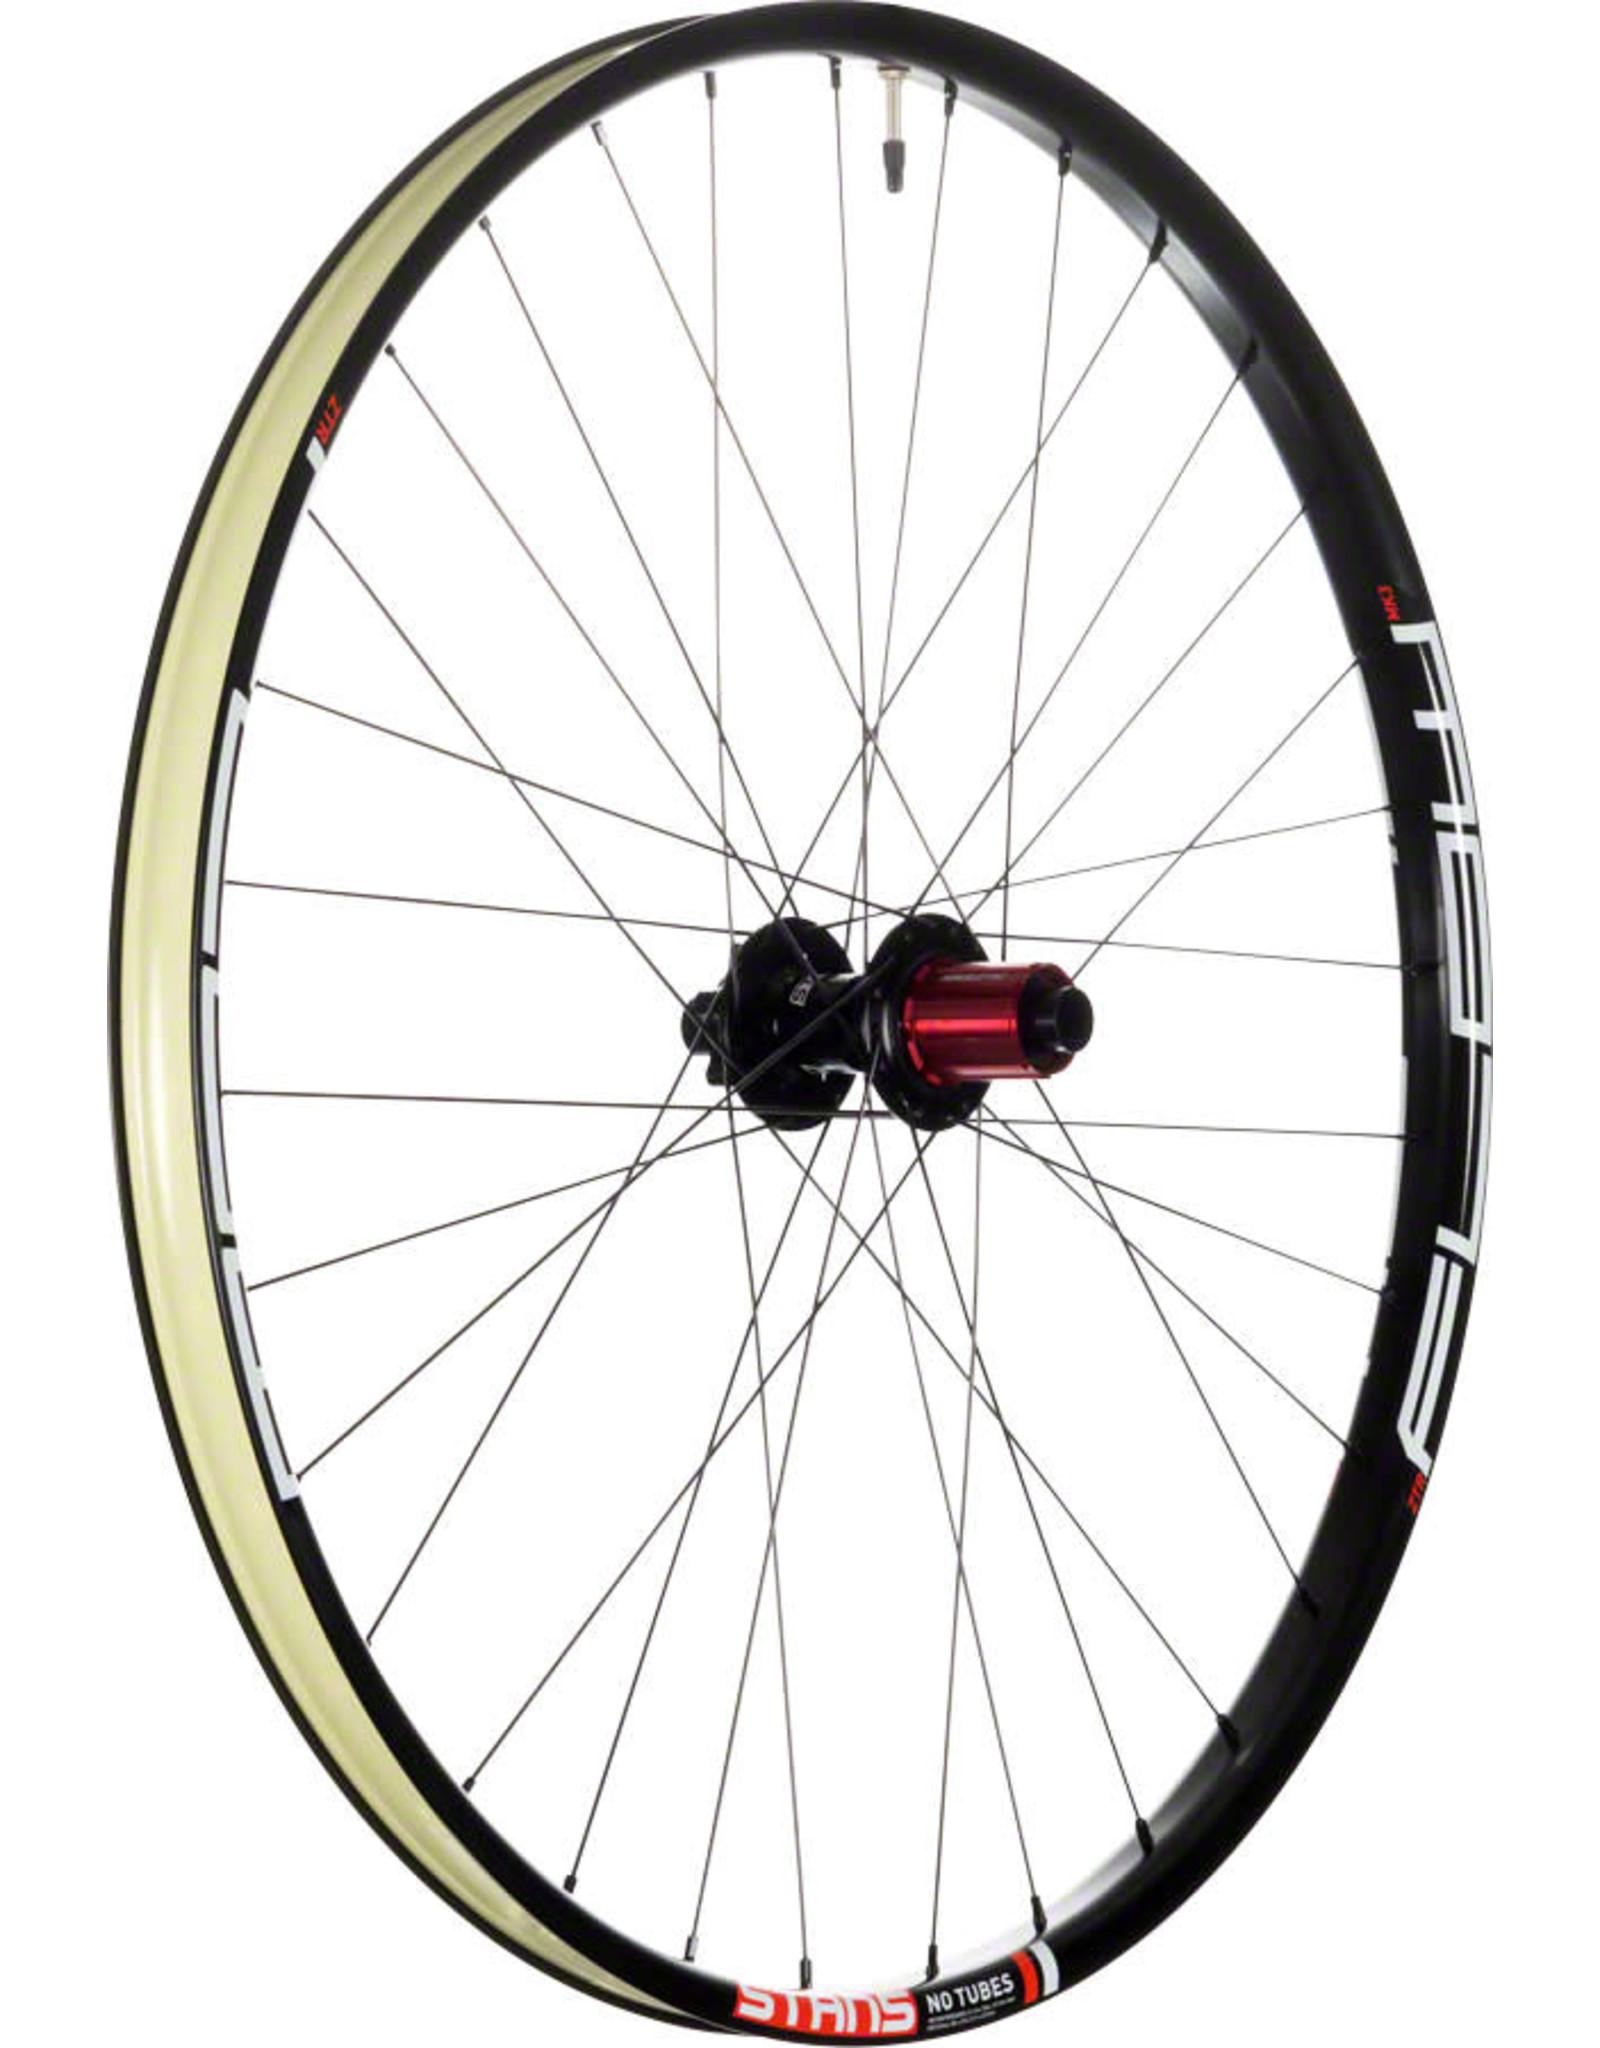 "Stan's No Tubes Stan's No Tubes Flow MK3 Rear Wheel - 29"", 12 x 148mm Boost, 6-Bolt, HG 11, Black"